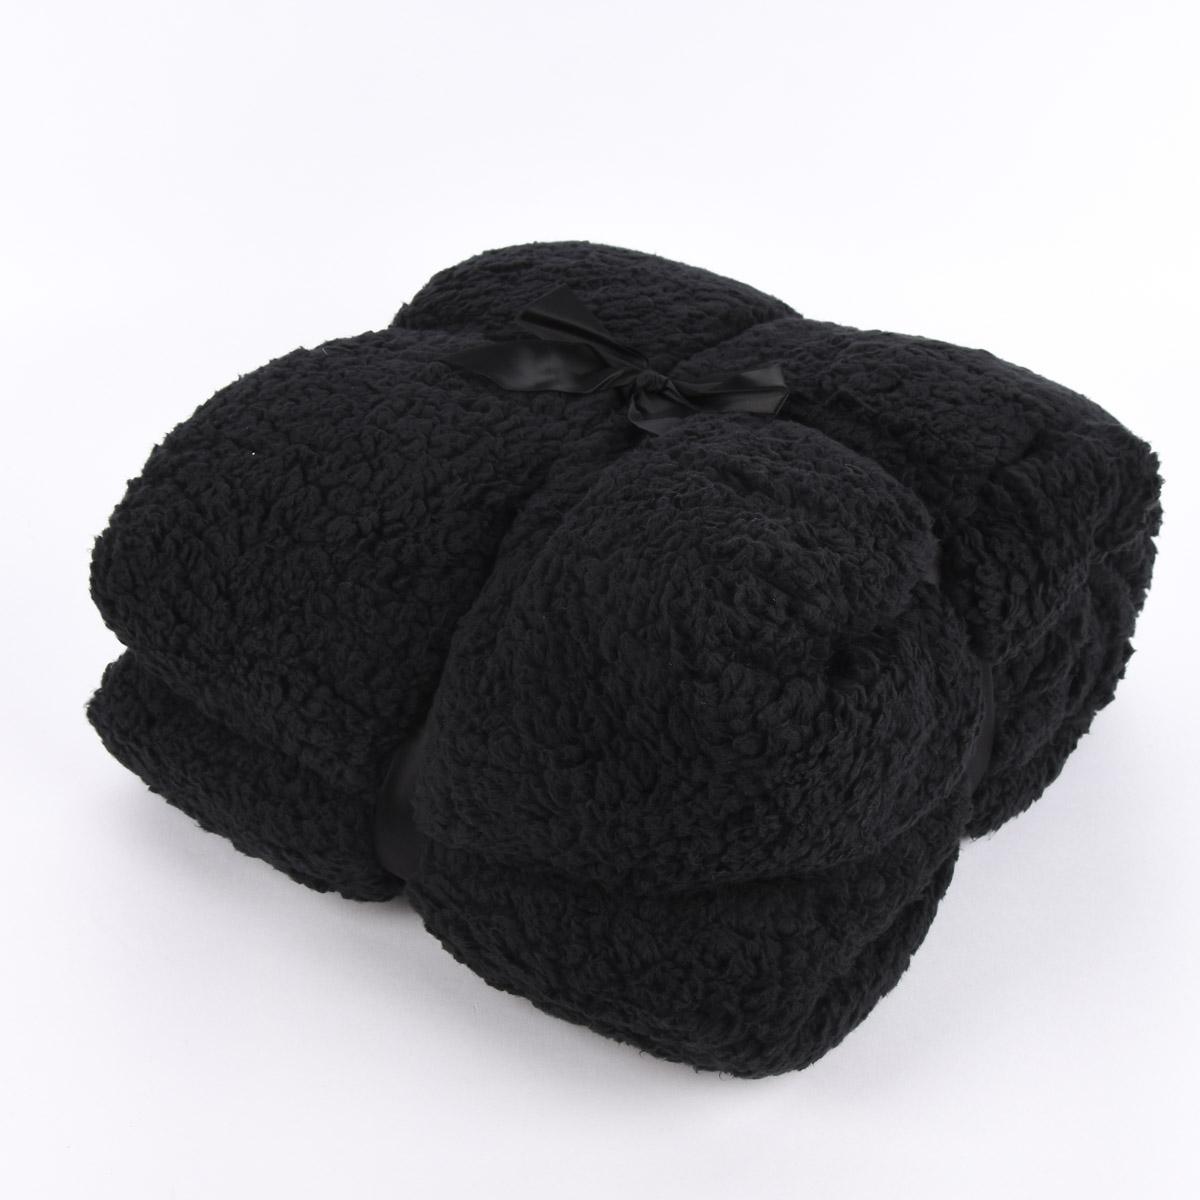 Mikrofaserdecke Kuscheldecke TEDDY schwarz 150x200cm